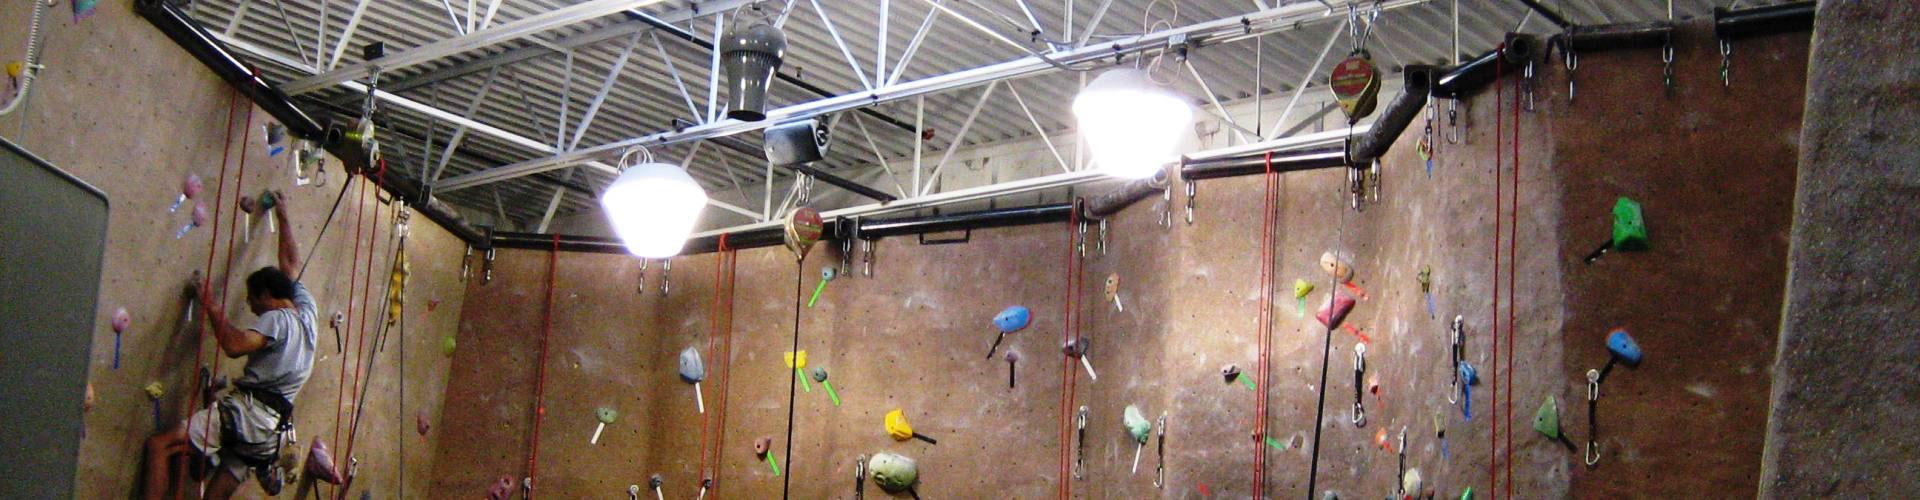 Destratification Fan System Sports Leisure Slider 7